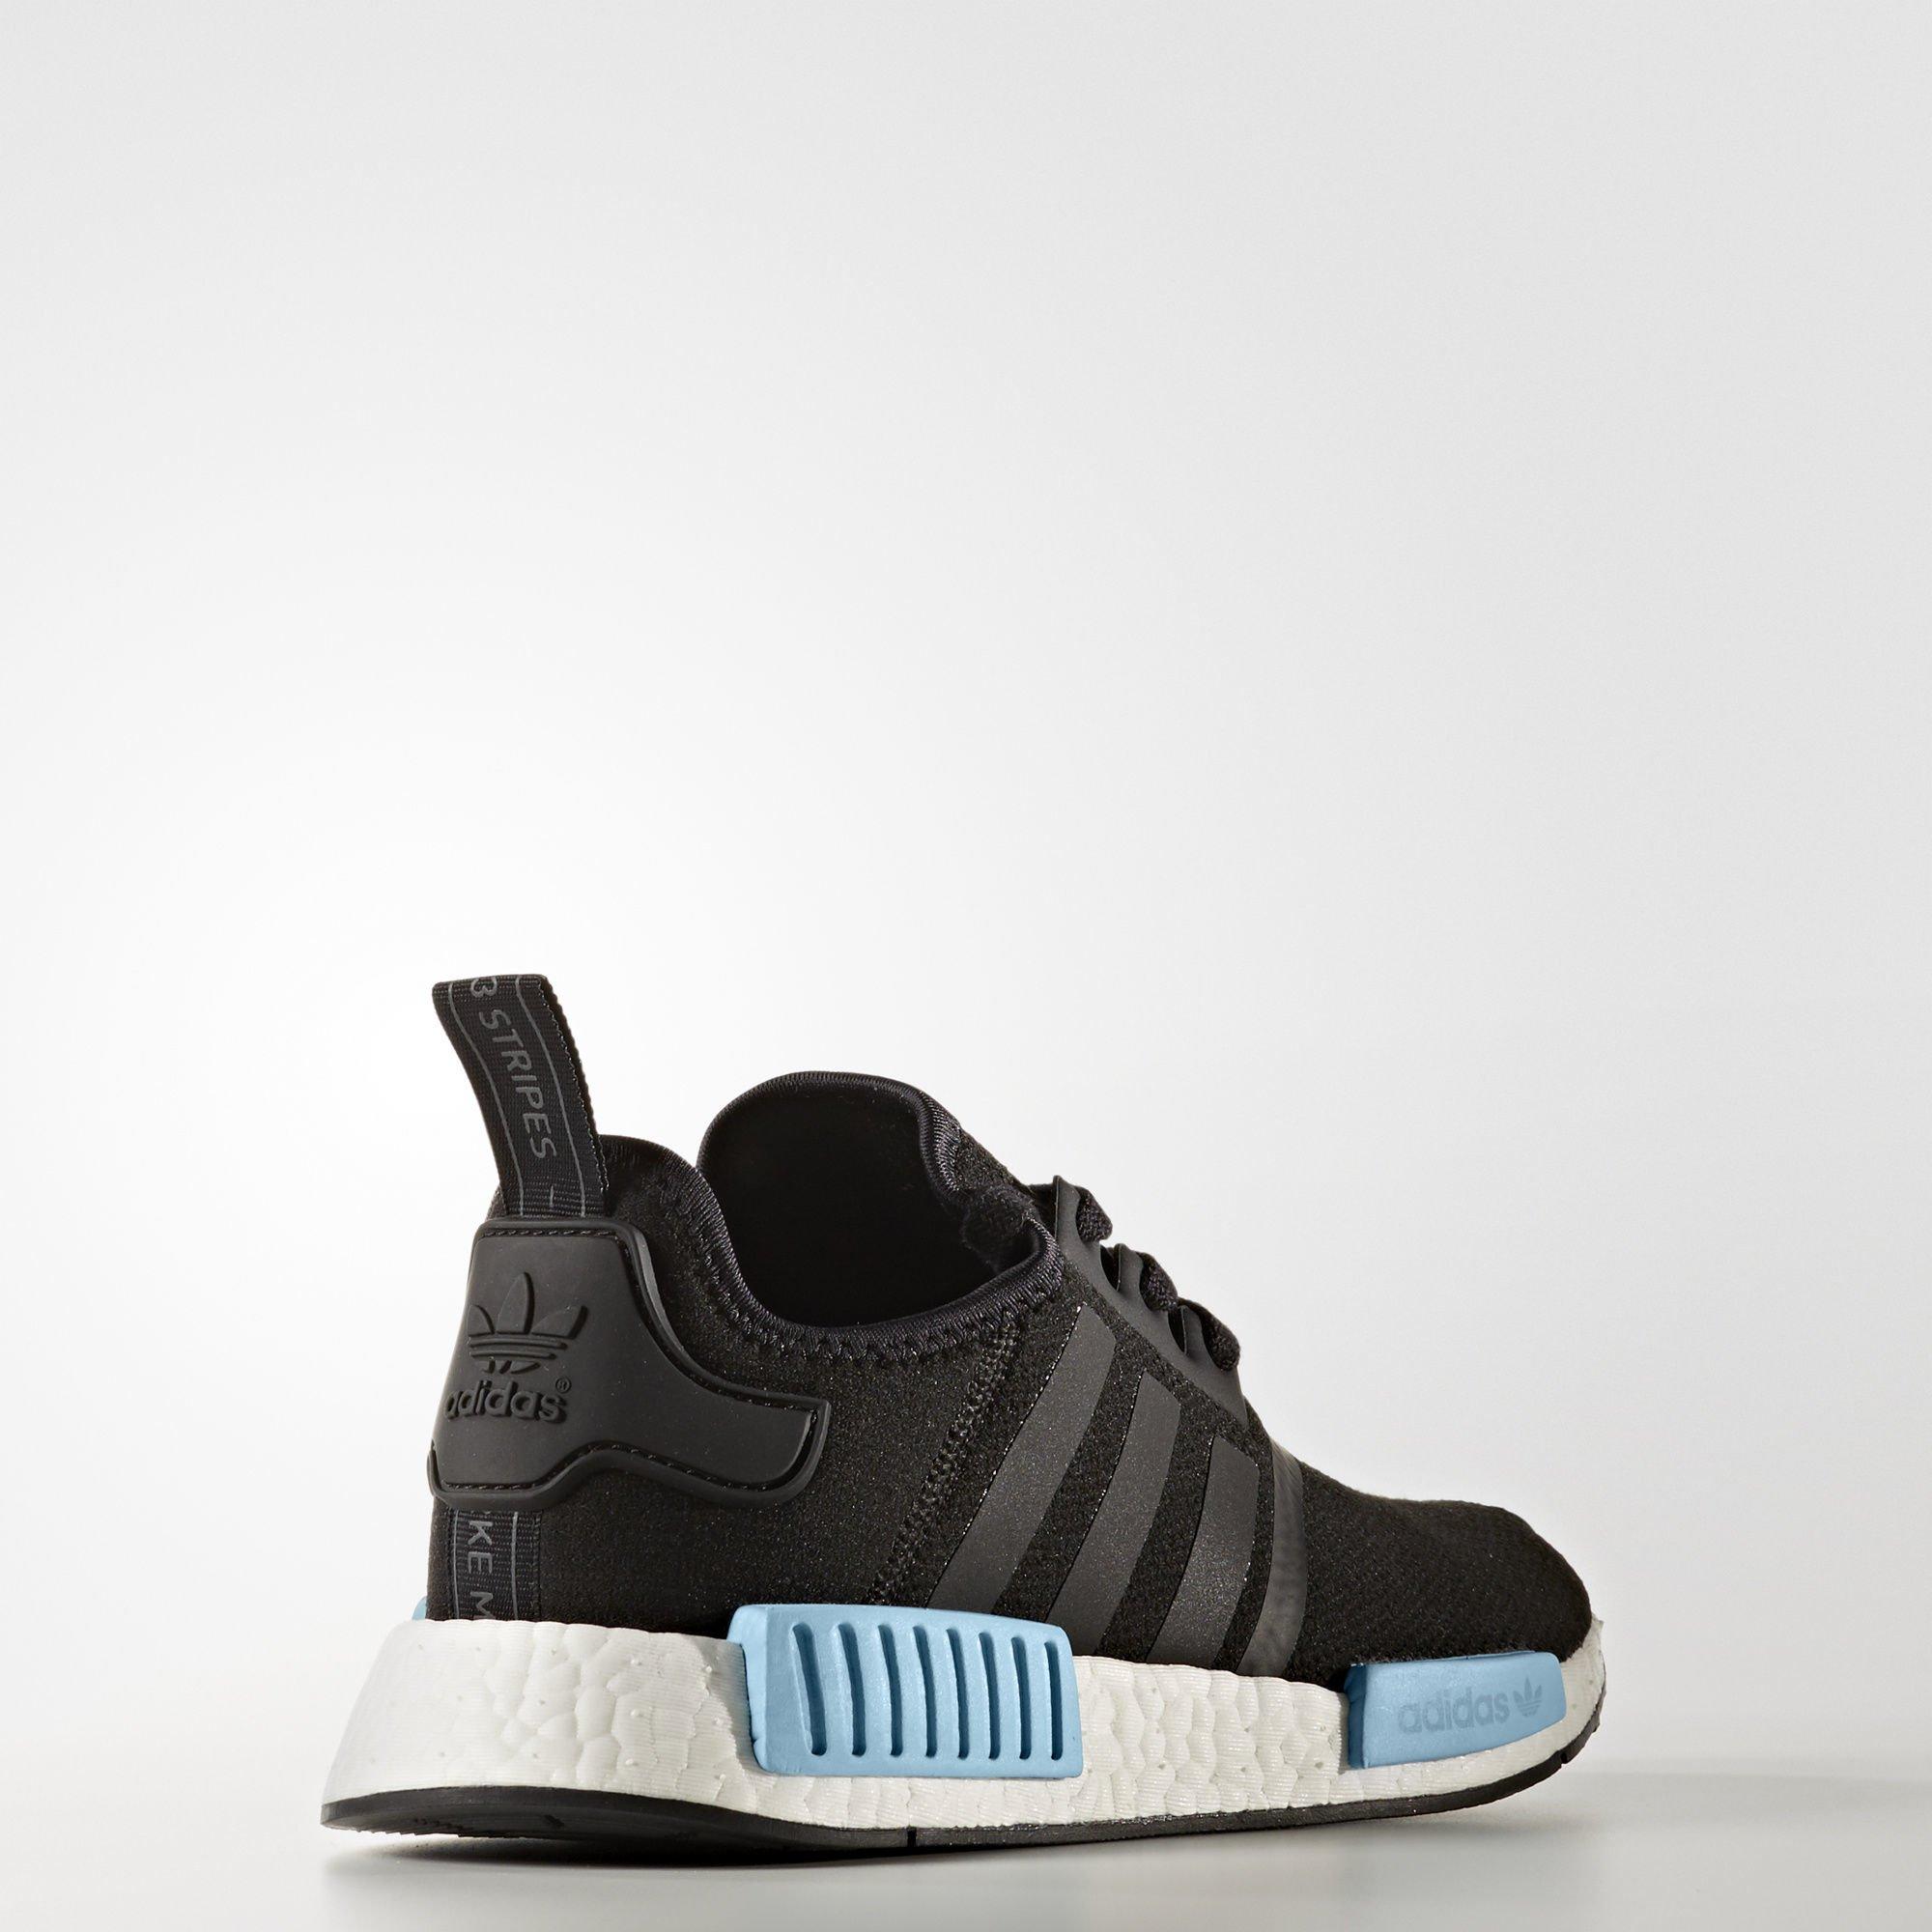 Adidas NMD R1 BY9951